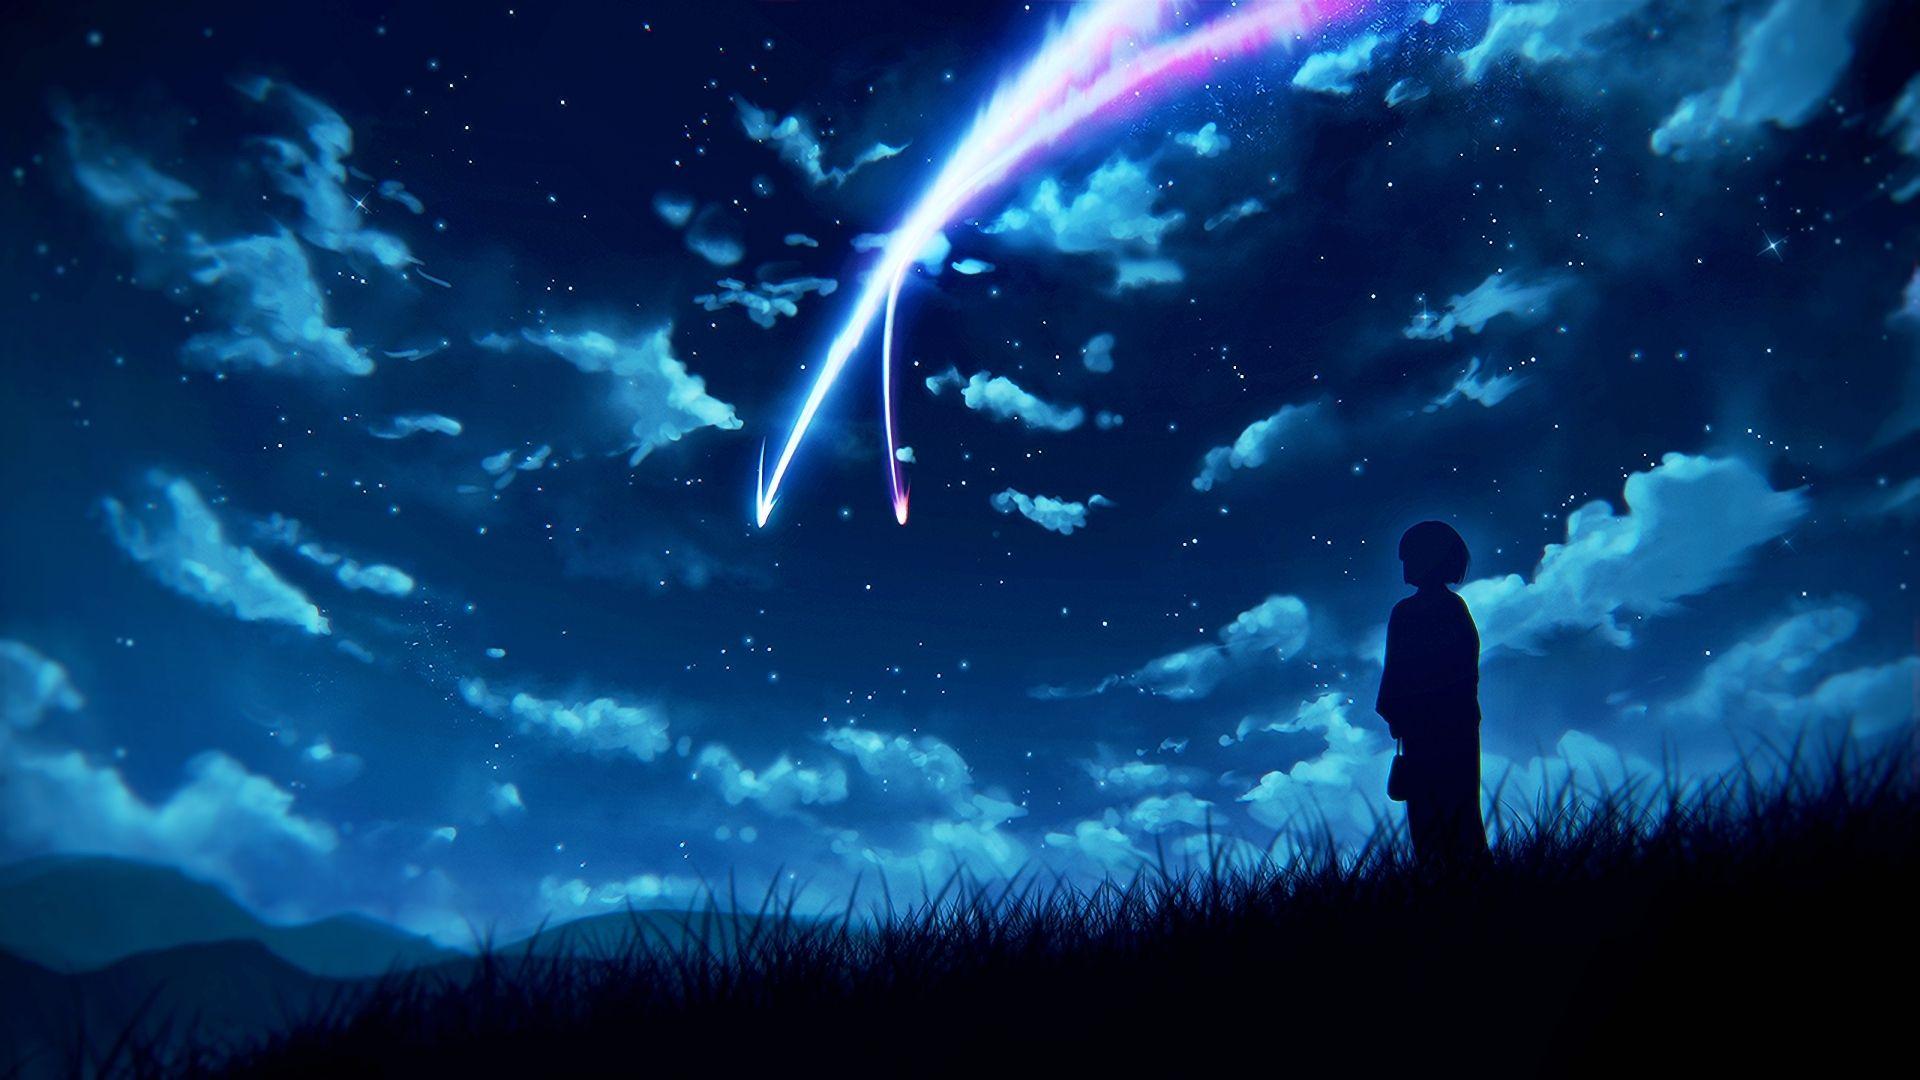 Anime Your Name Mitsuha Miyamizu Kimi No Na Wa Fond D Ecran Paysage Manga Fond Ecran 1920x1080 Fond Ecran Paysage